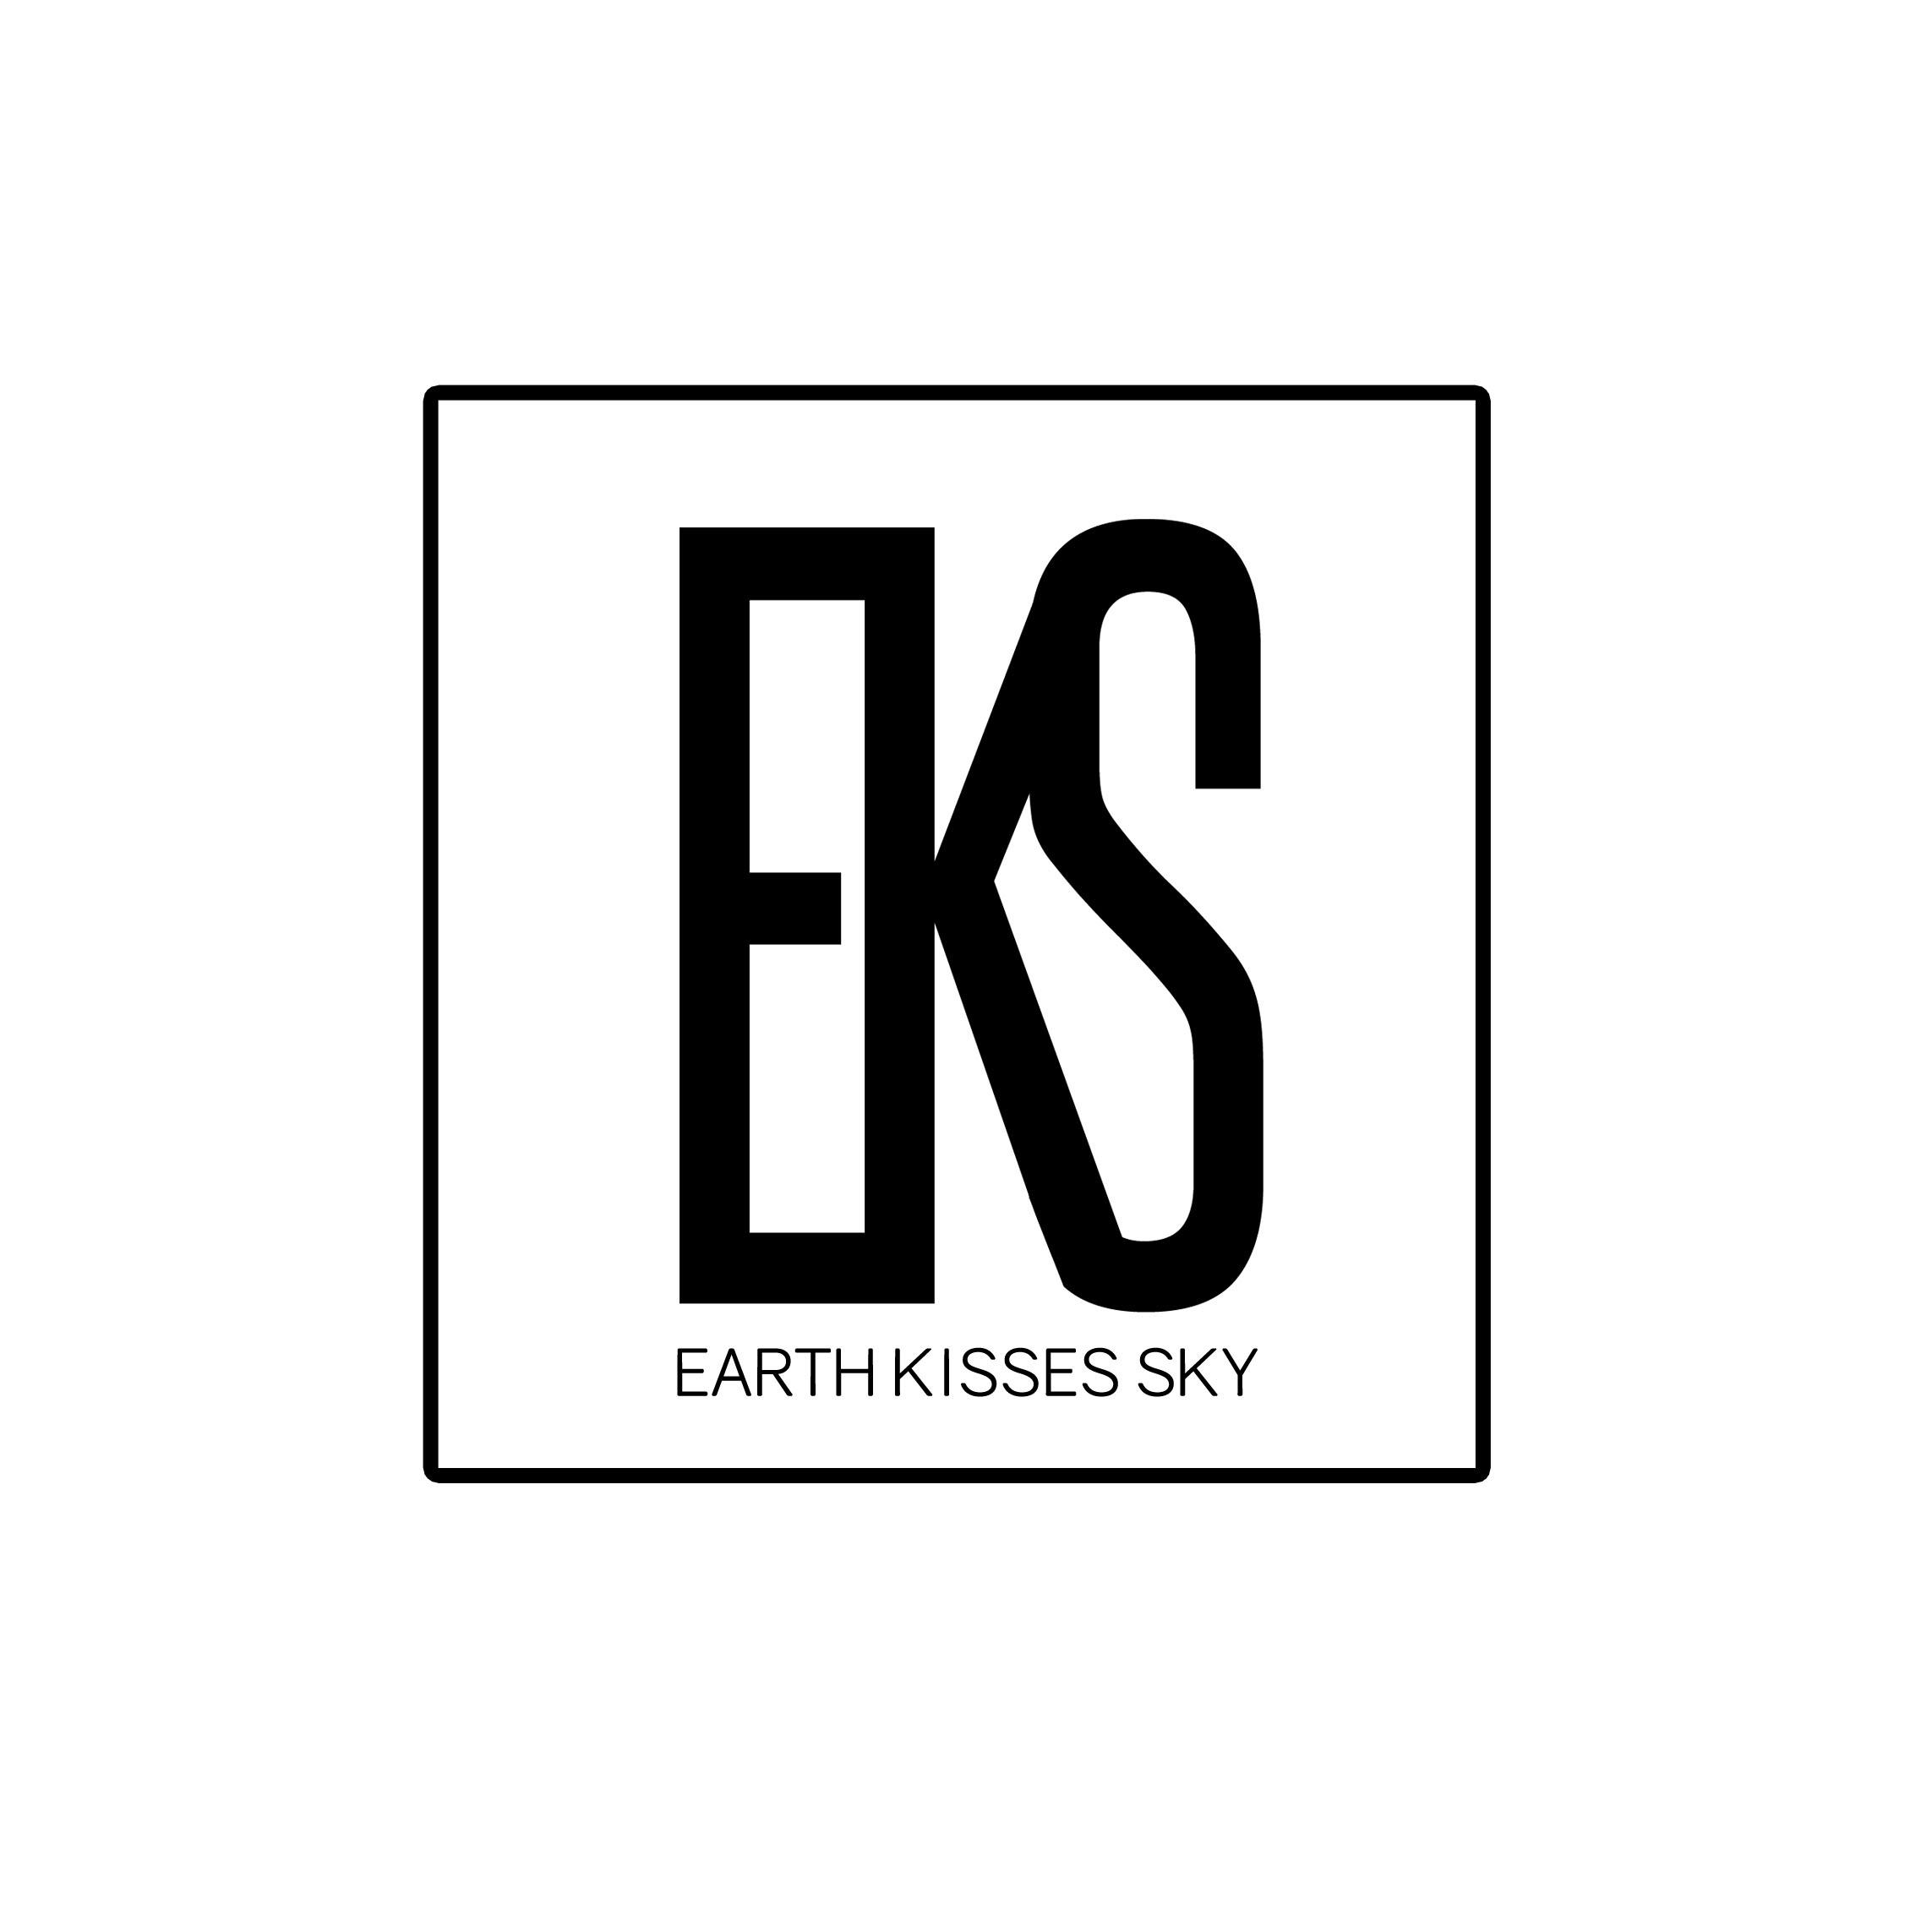 Earth Kisses Sky - Cannabis Cosmetics Retailer